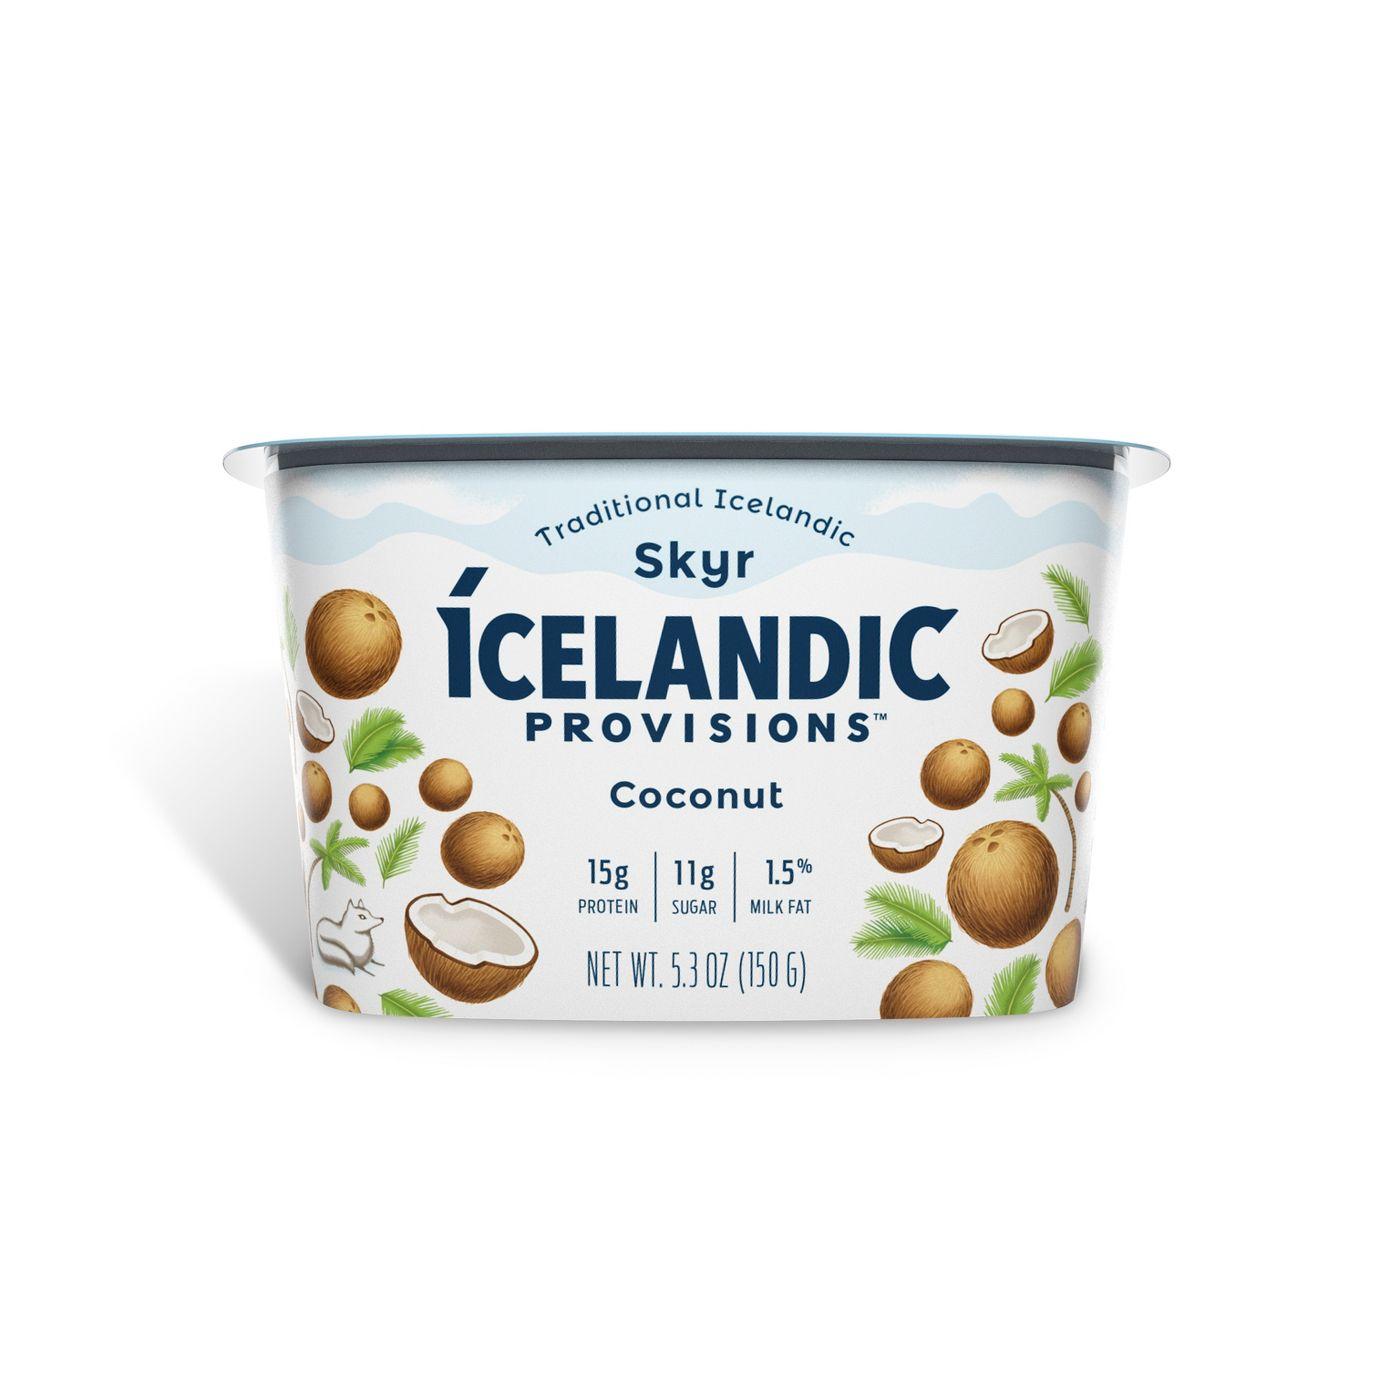 Icelandic Provisions Coconut Skyr Yogurt - 5.3oz - image 1 of 4